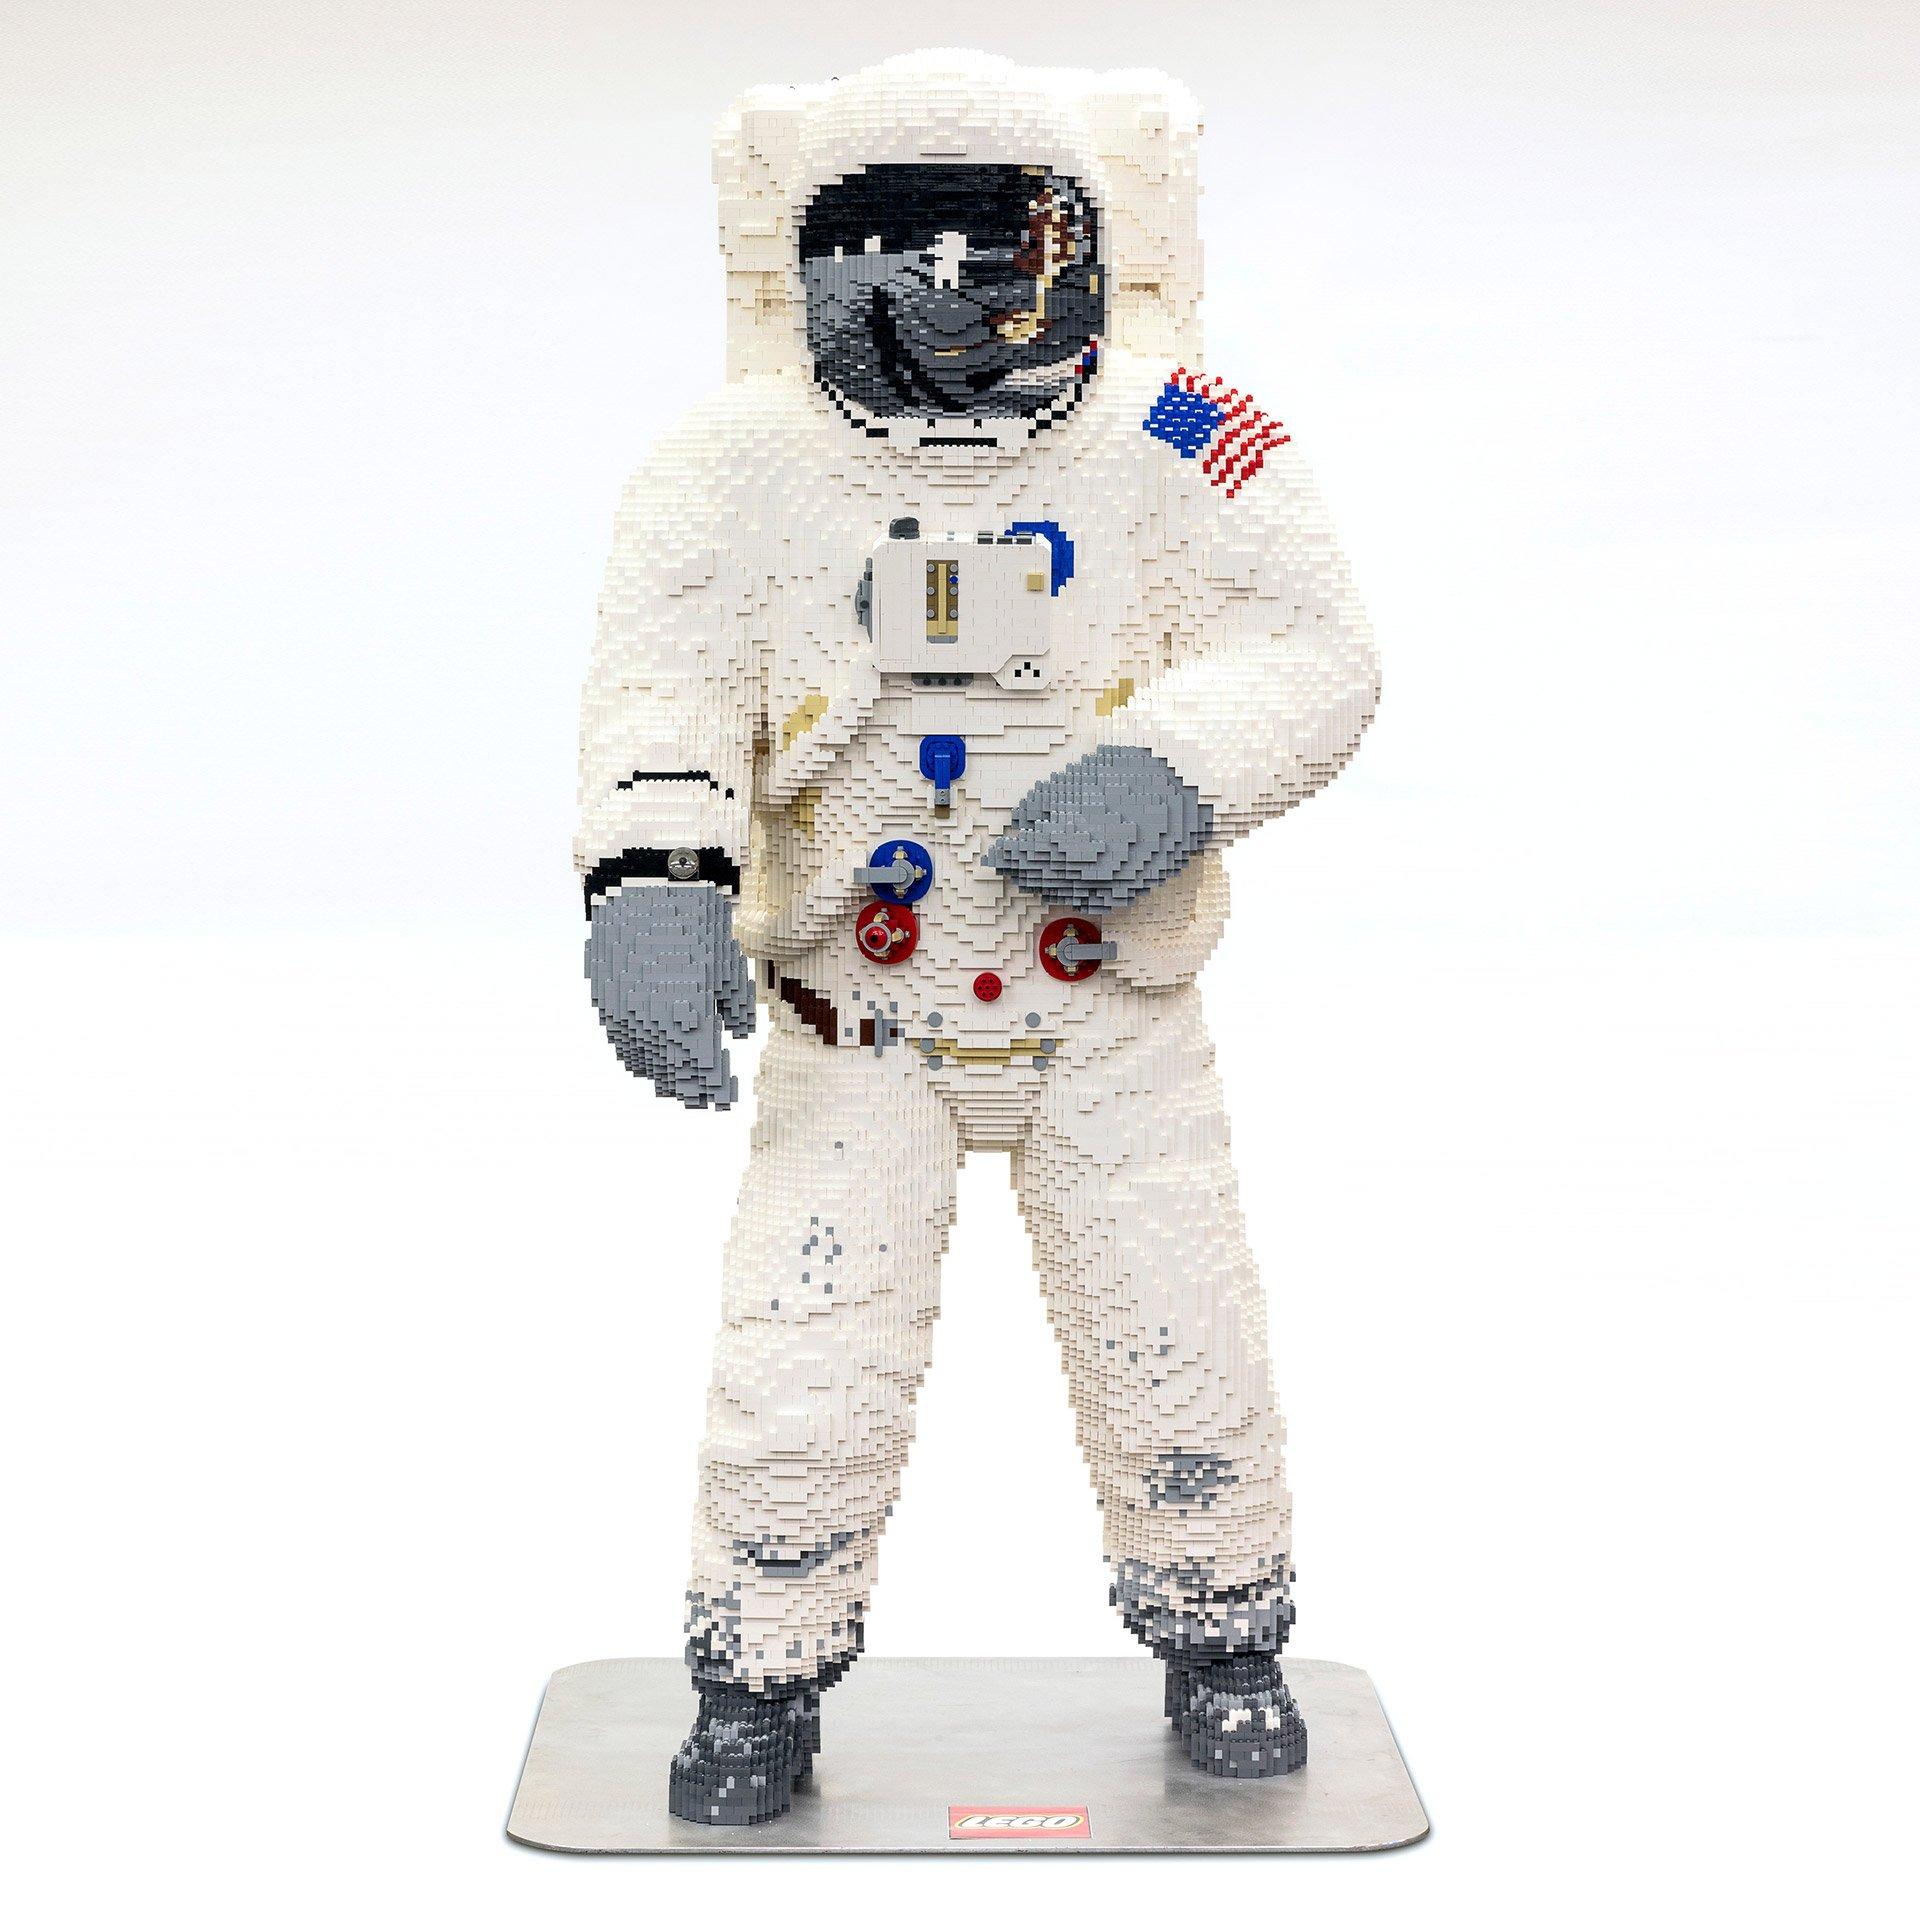 Life-Size LEGO Astronaut